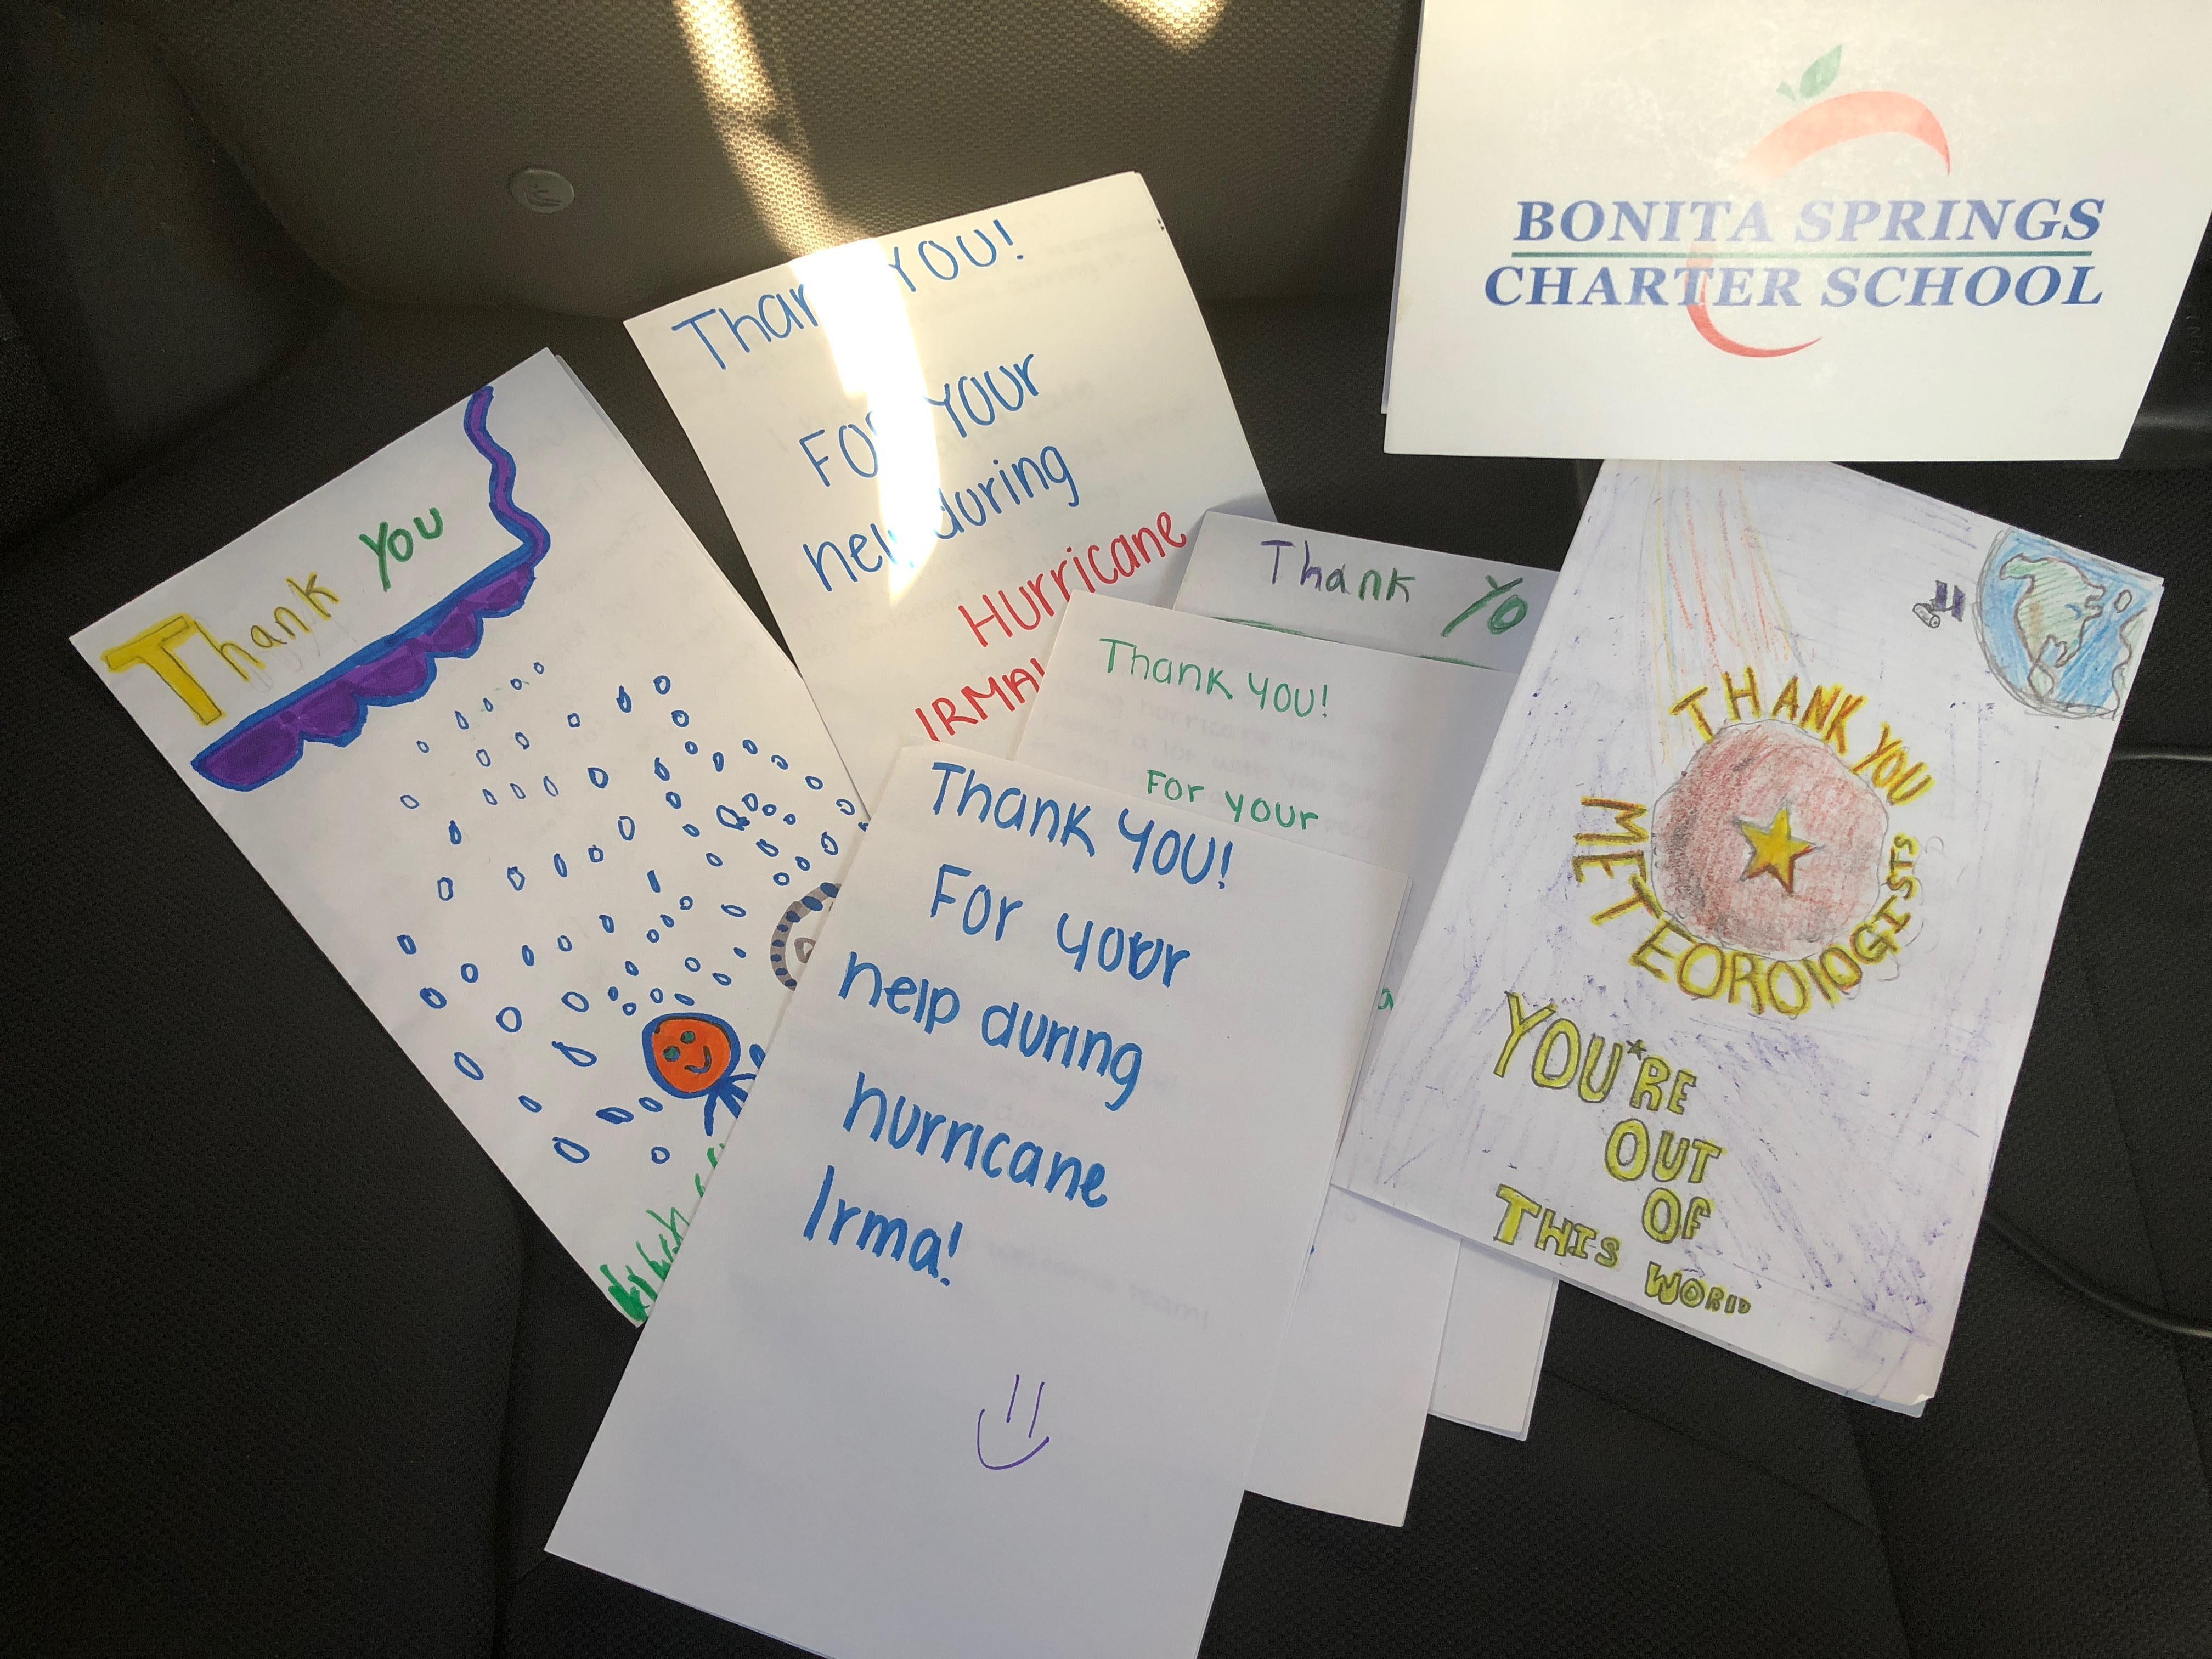 Bonita Springs Charter School Students Thank First Responders